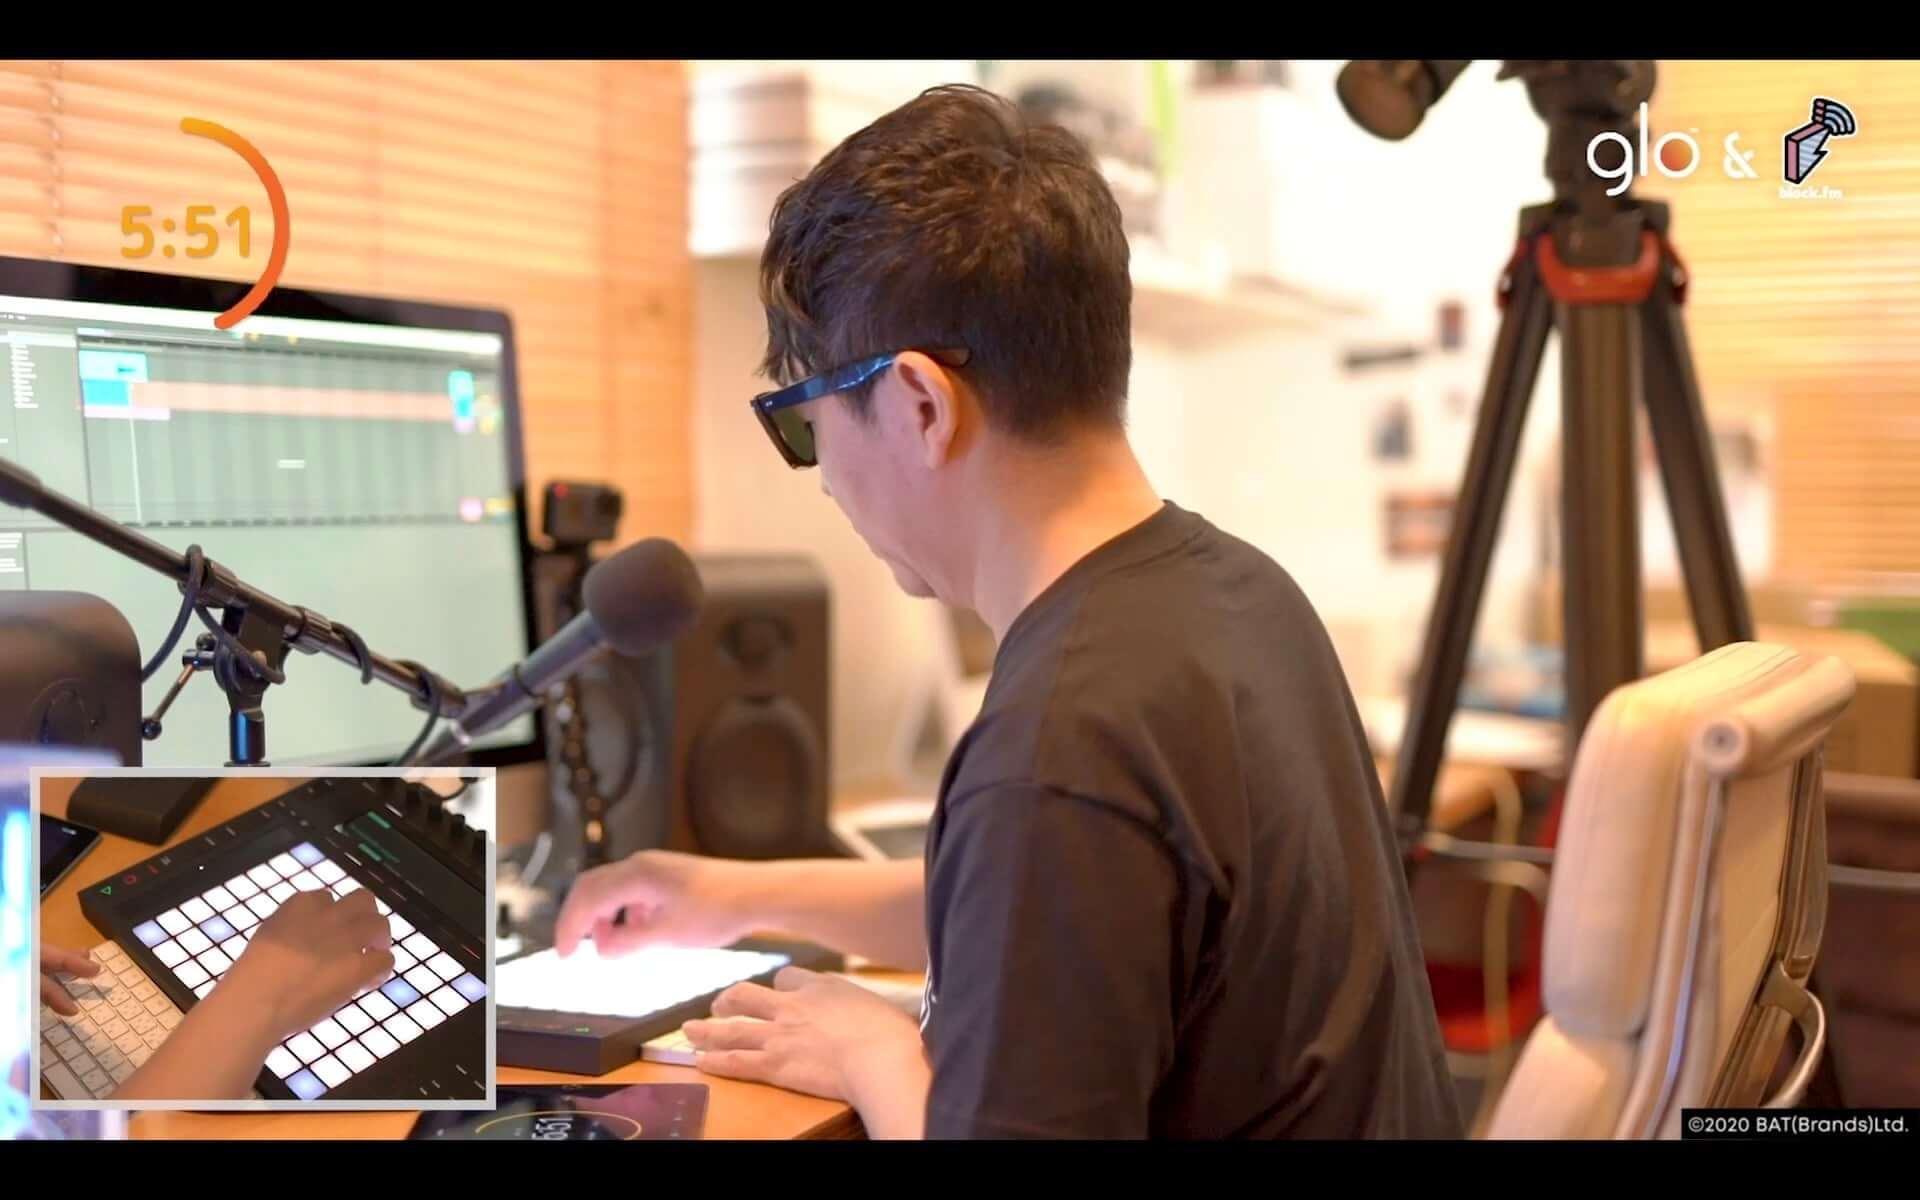 Seiho、tofubeats、Yamato、☆Taku Takahashiが様々なお題に挑戦!glo™とblock.fmが贈る動画シリーズが公開 music200916_glo-blockfm_13-1920x1200